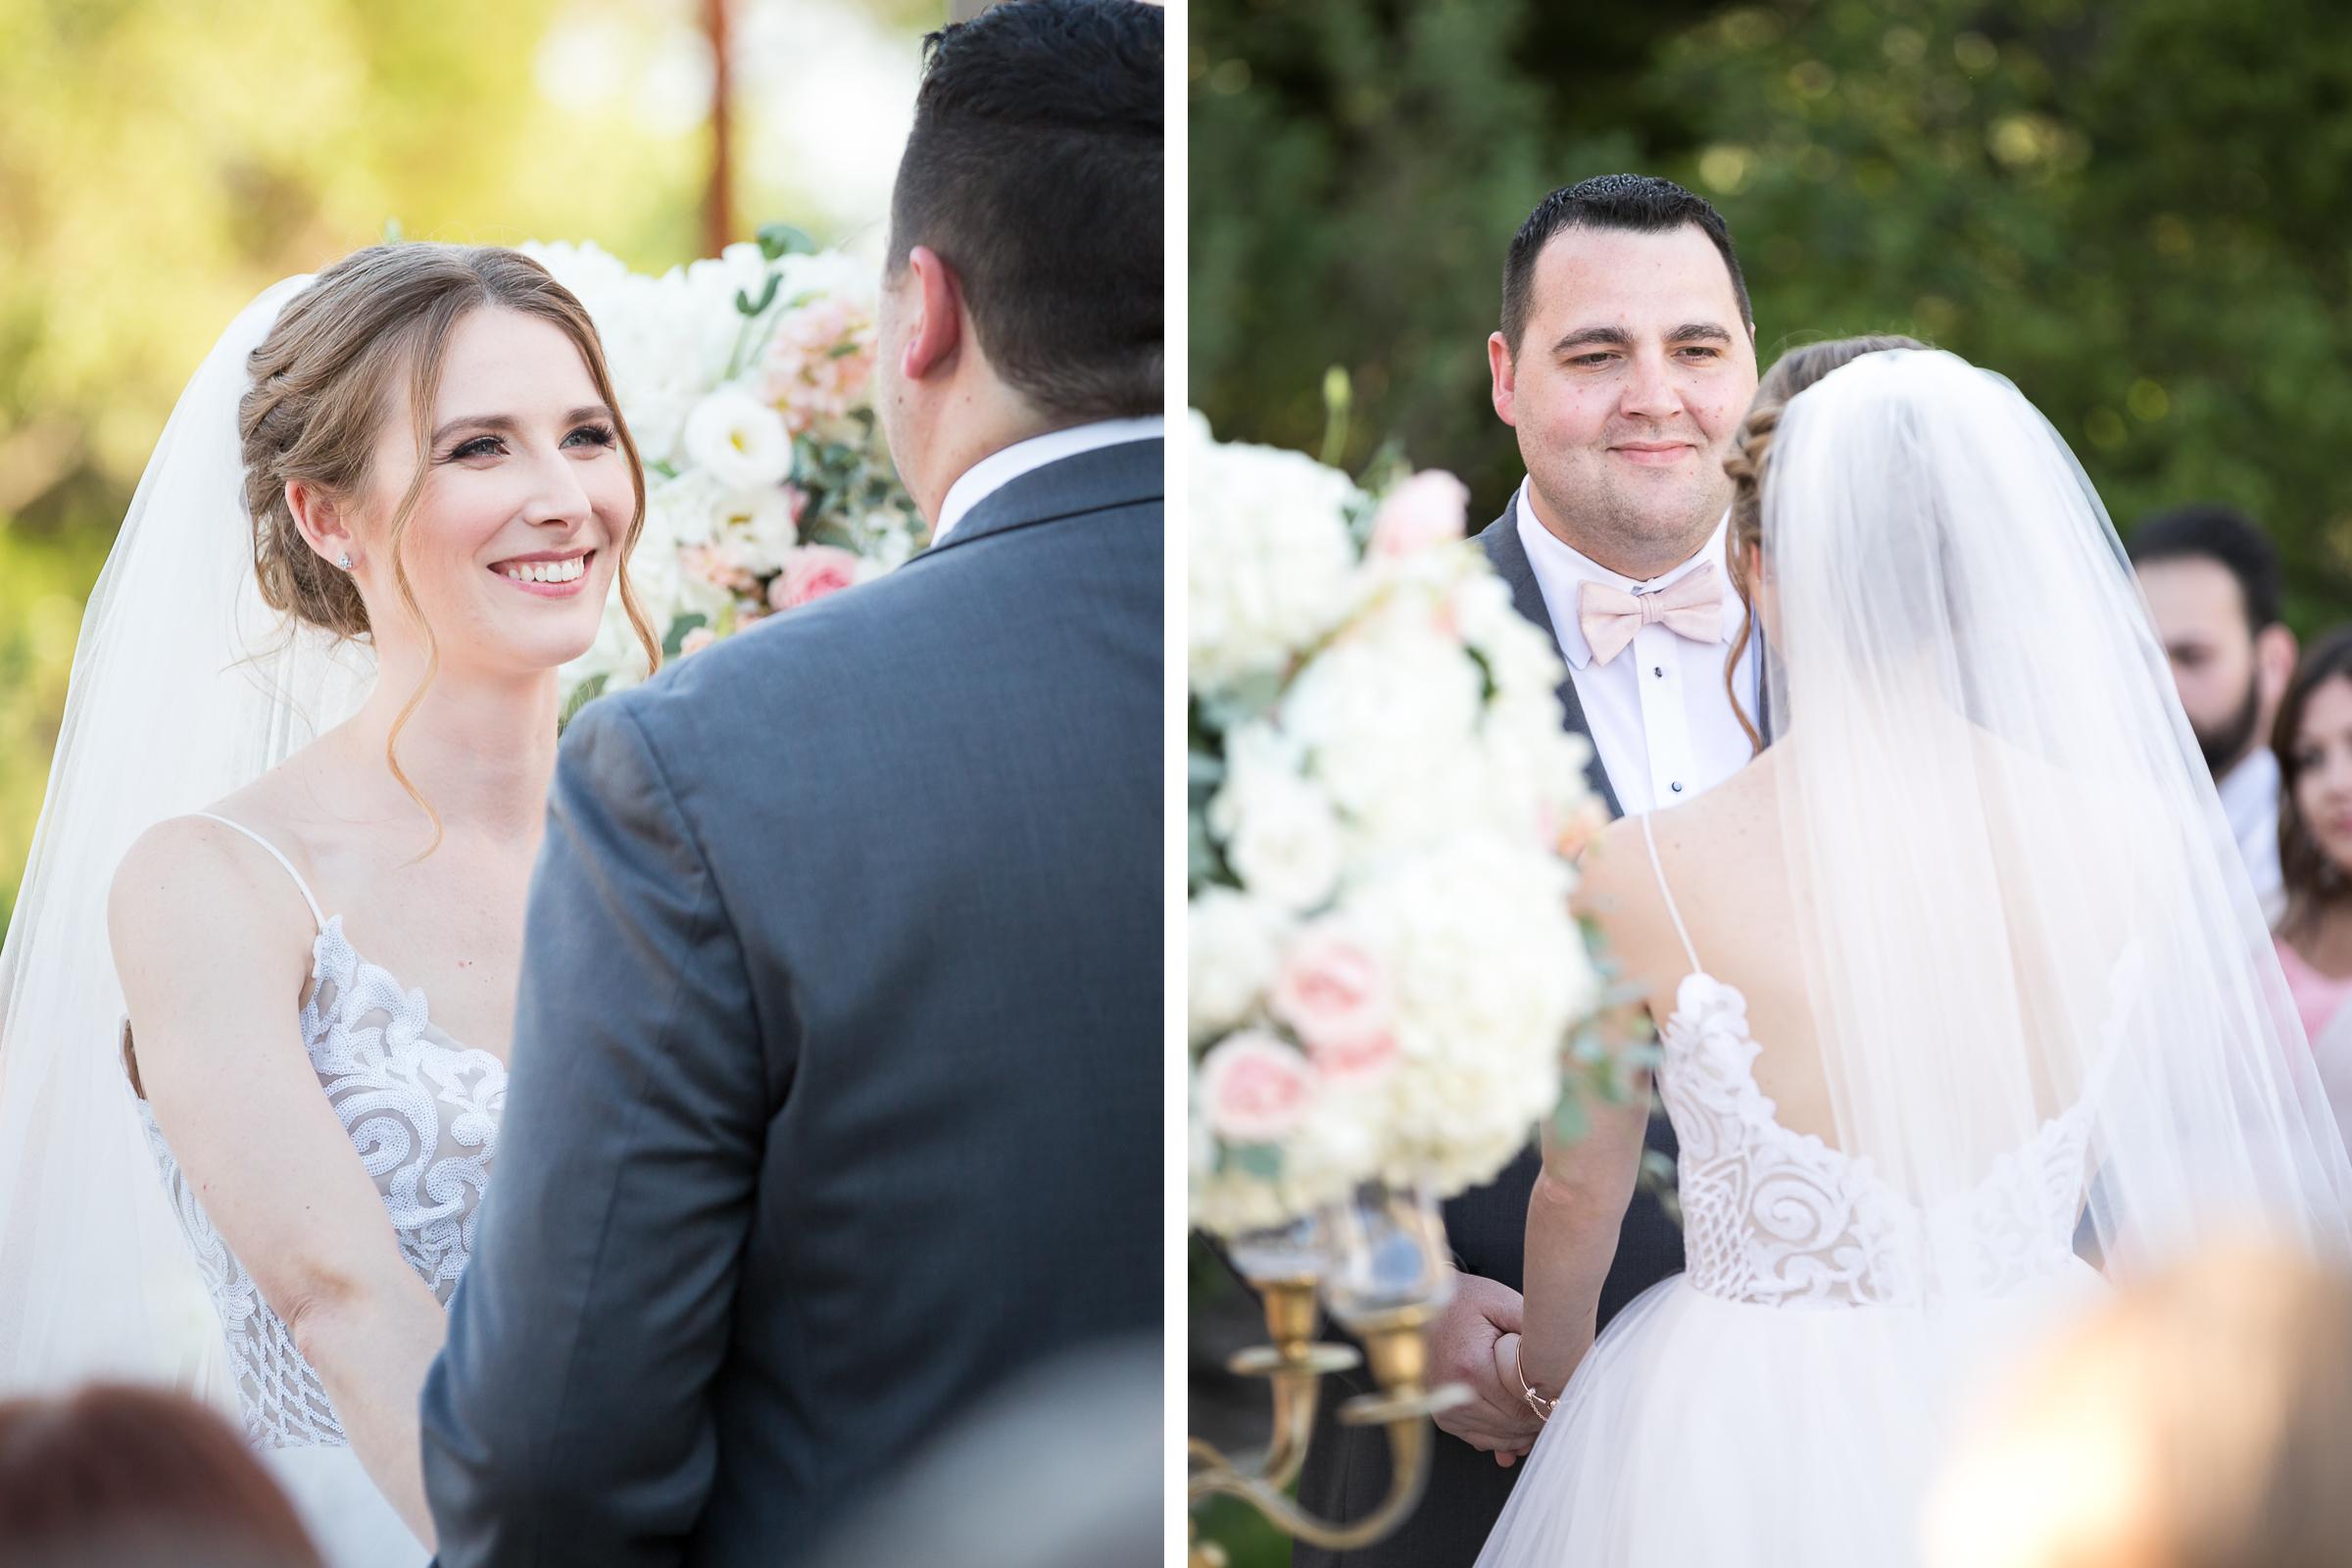 wedding-photographer-dripping-springs.jpg